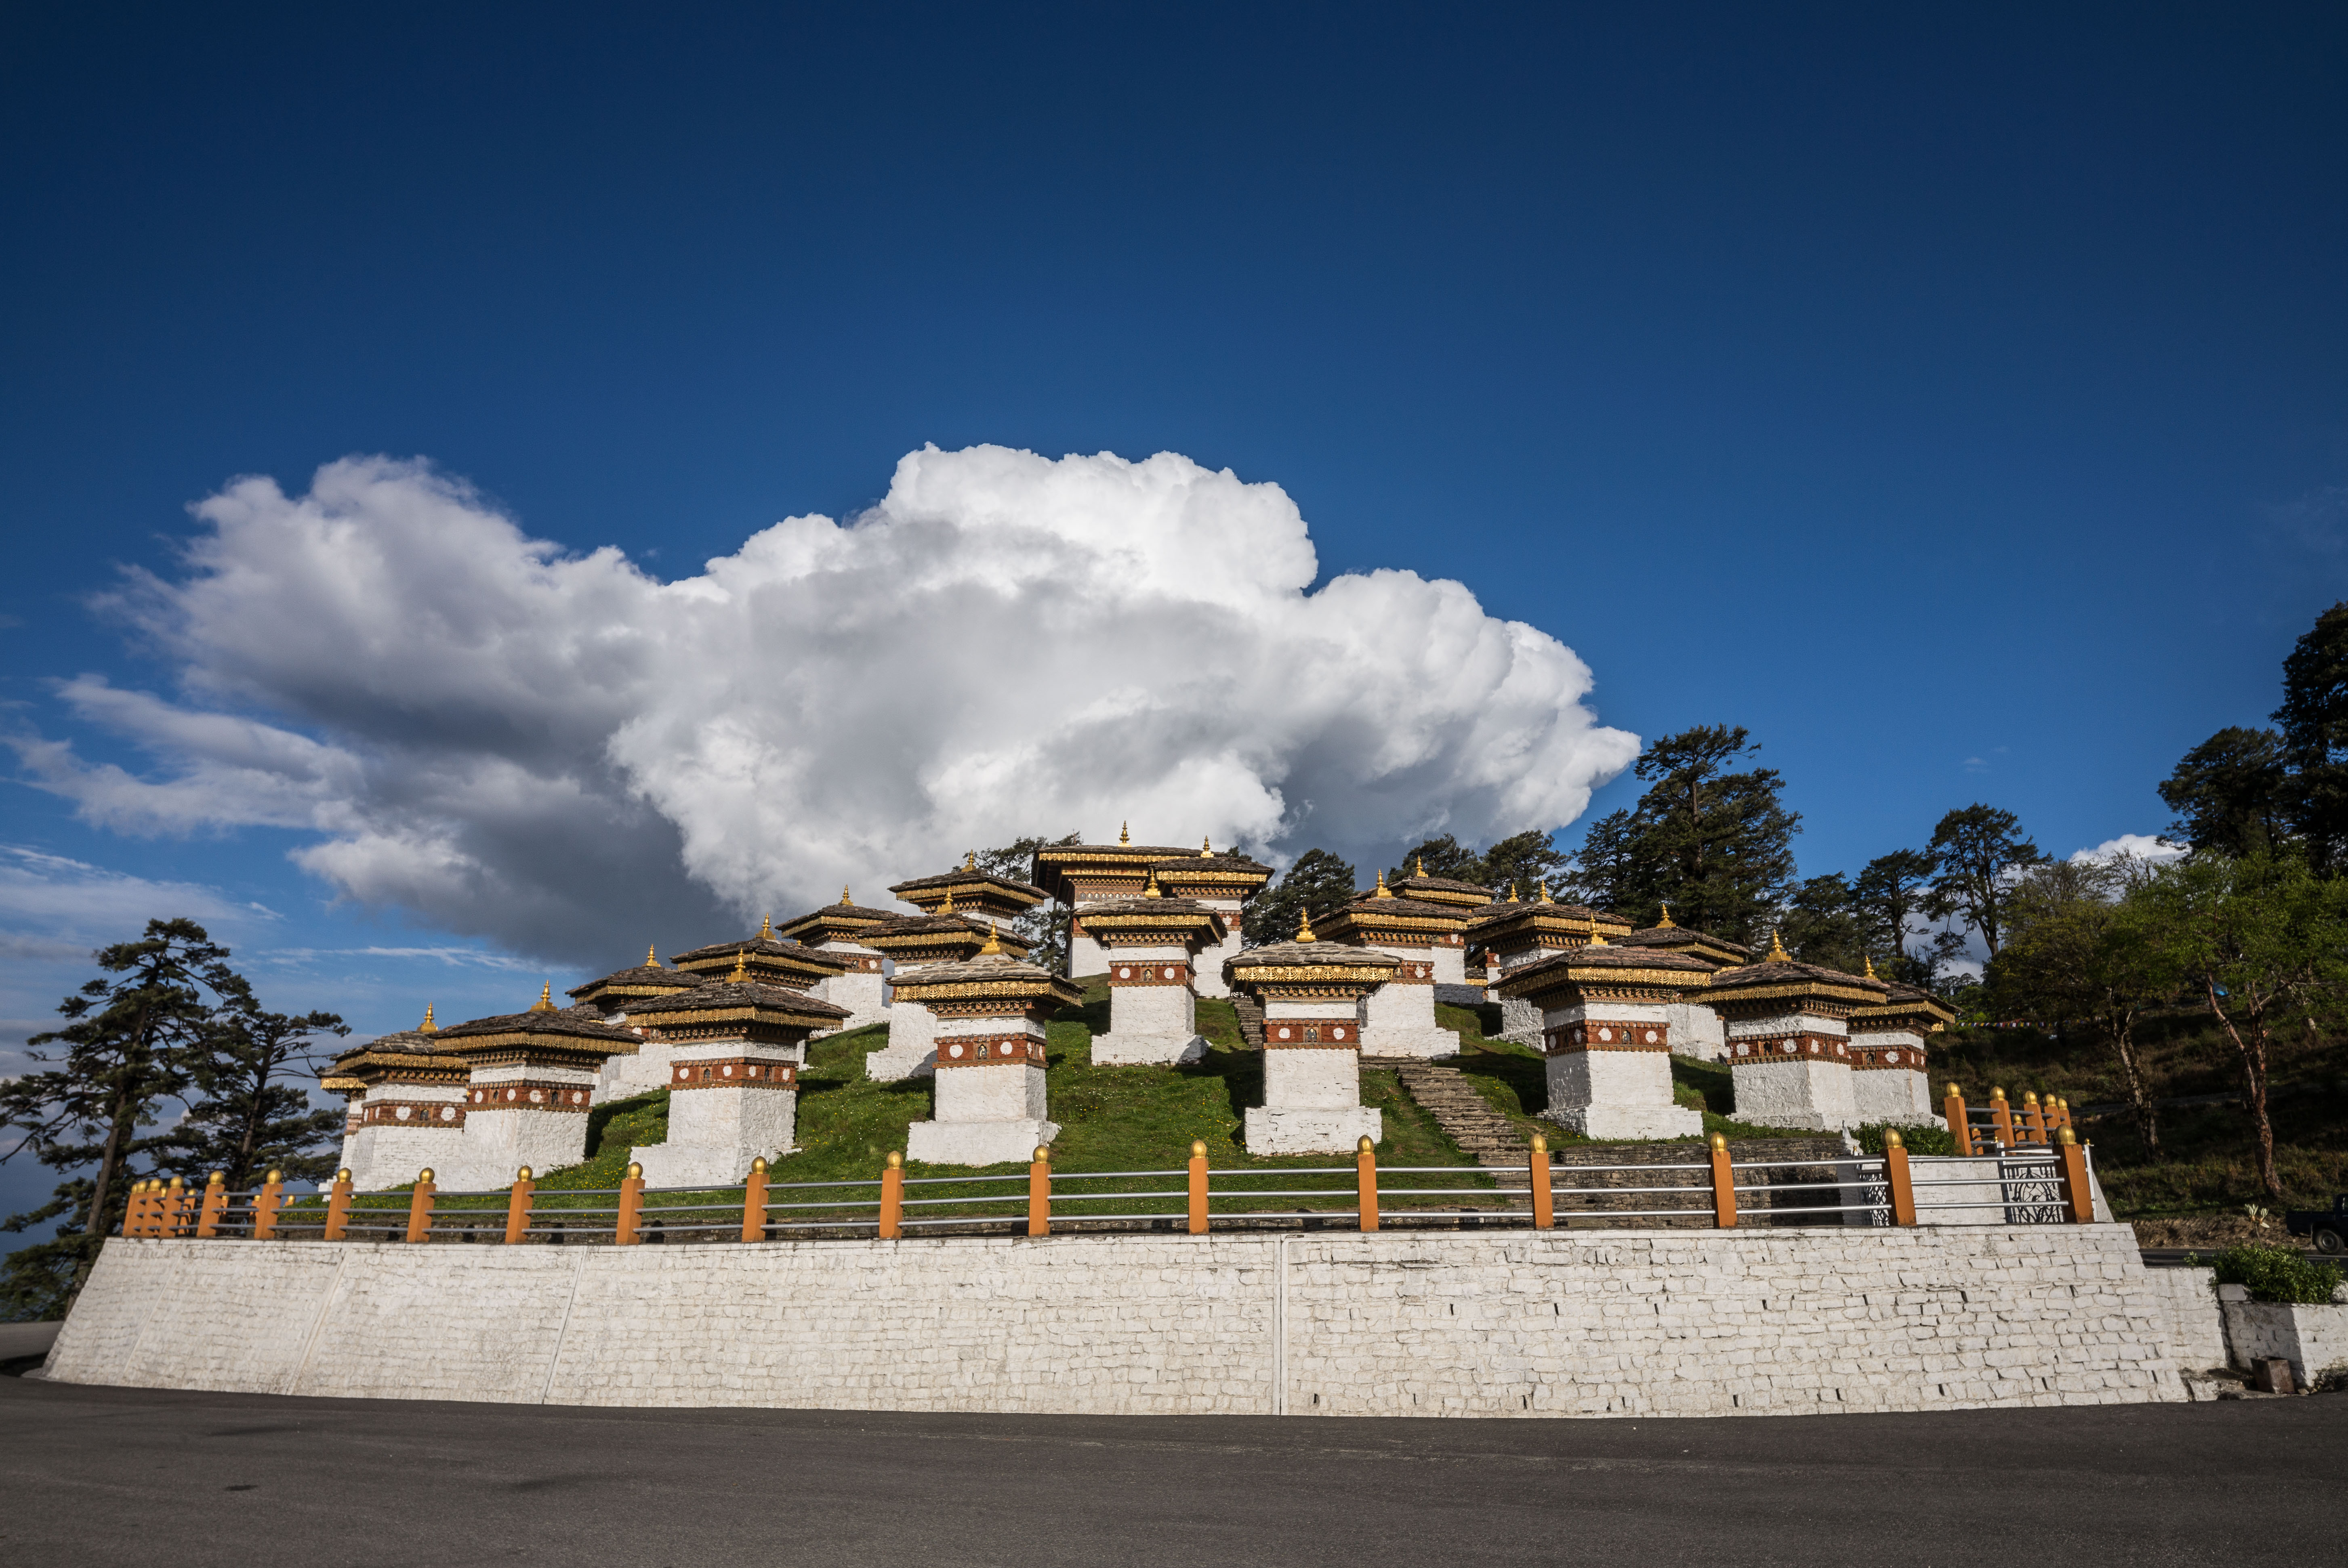 Spring time in Bhutan